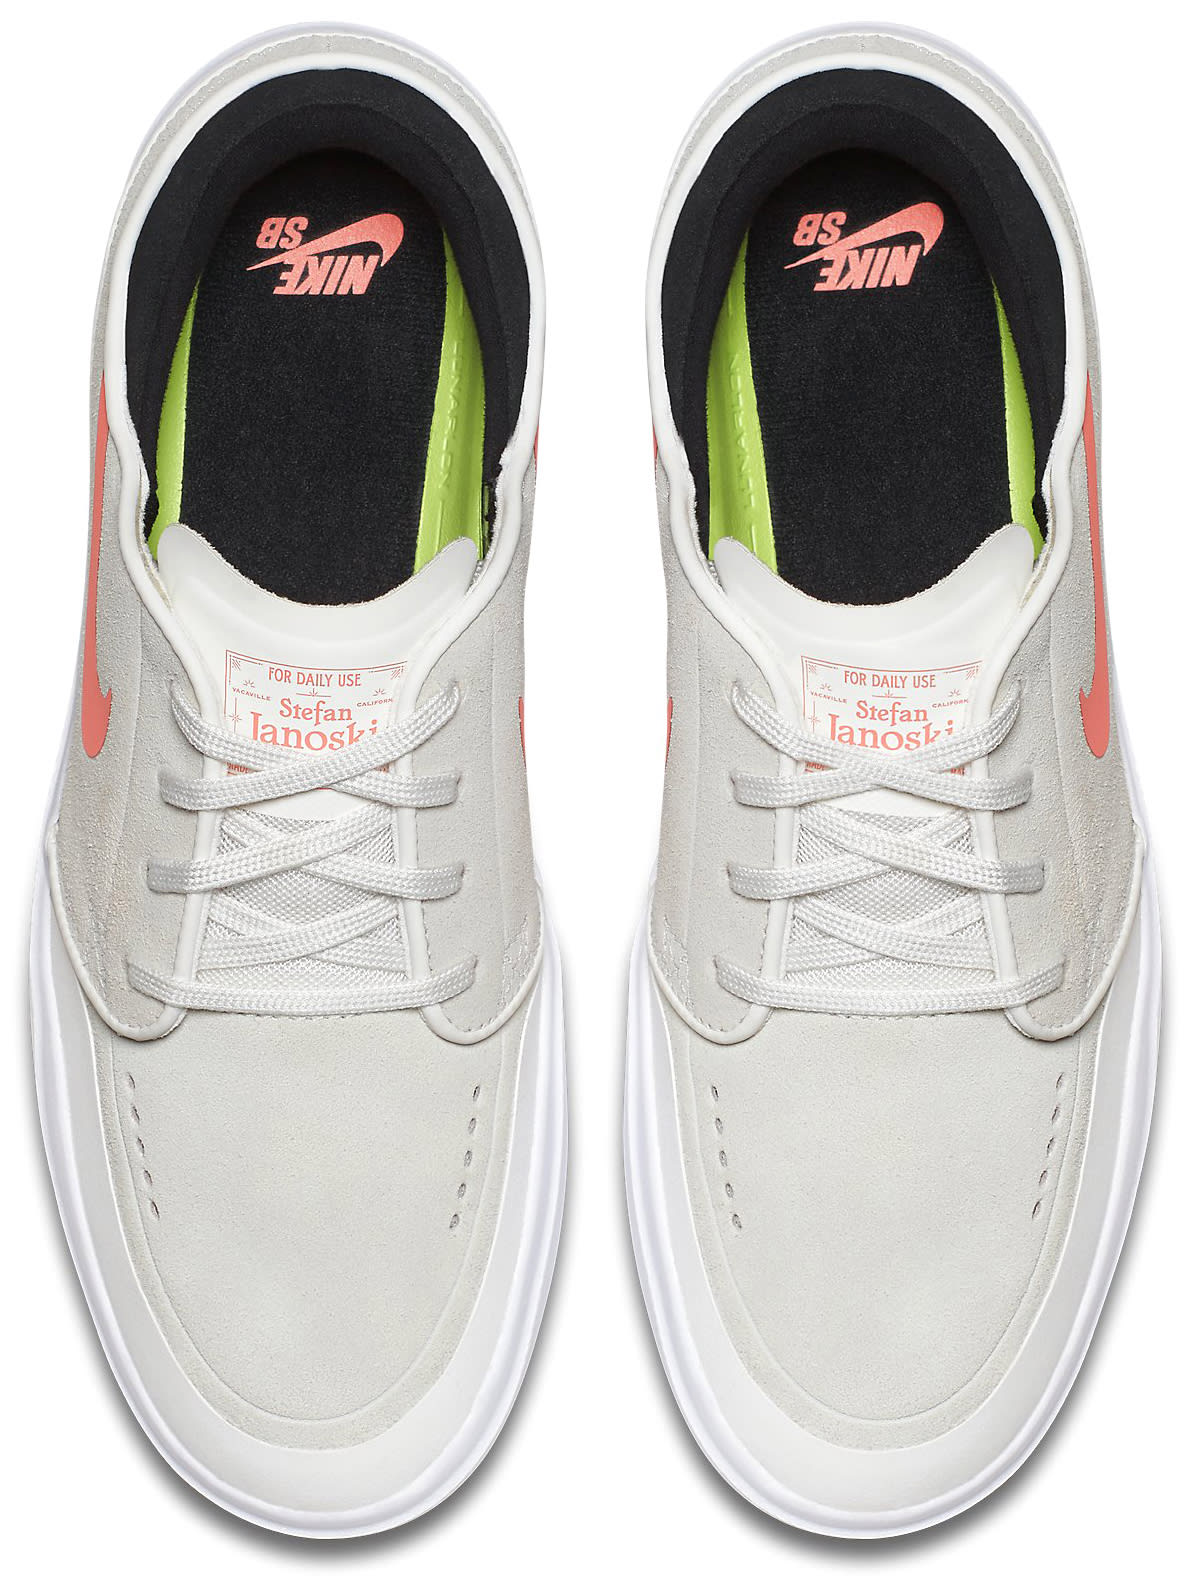 new concept 8b542 2254f Nike Stefan Janoski Hyperfeel XT Skate Shoes - thumbnail 3